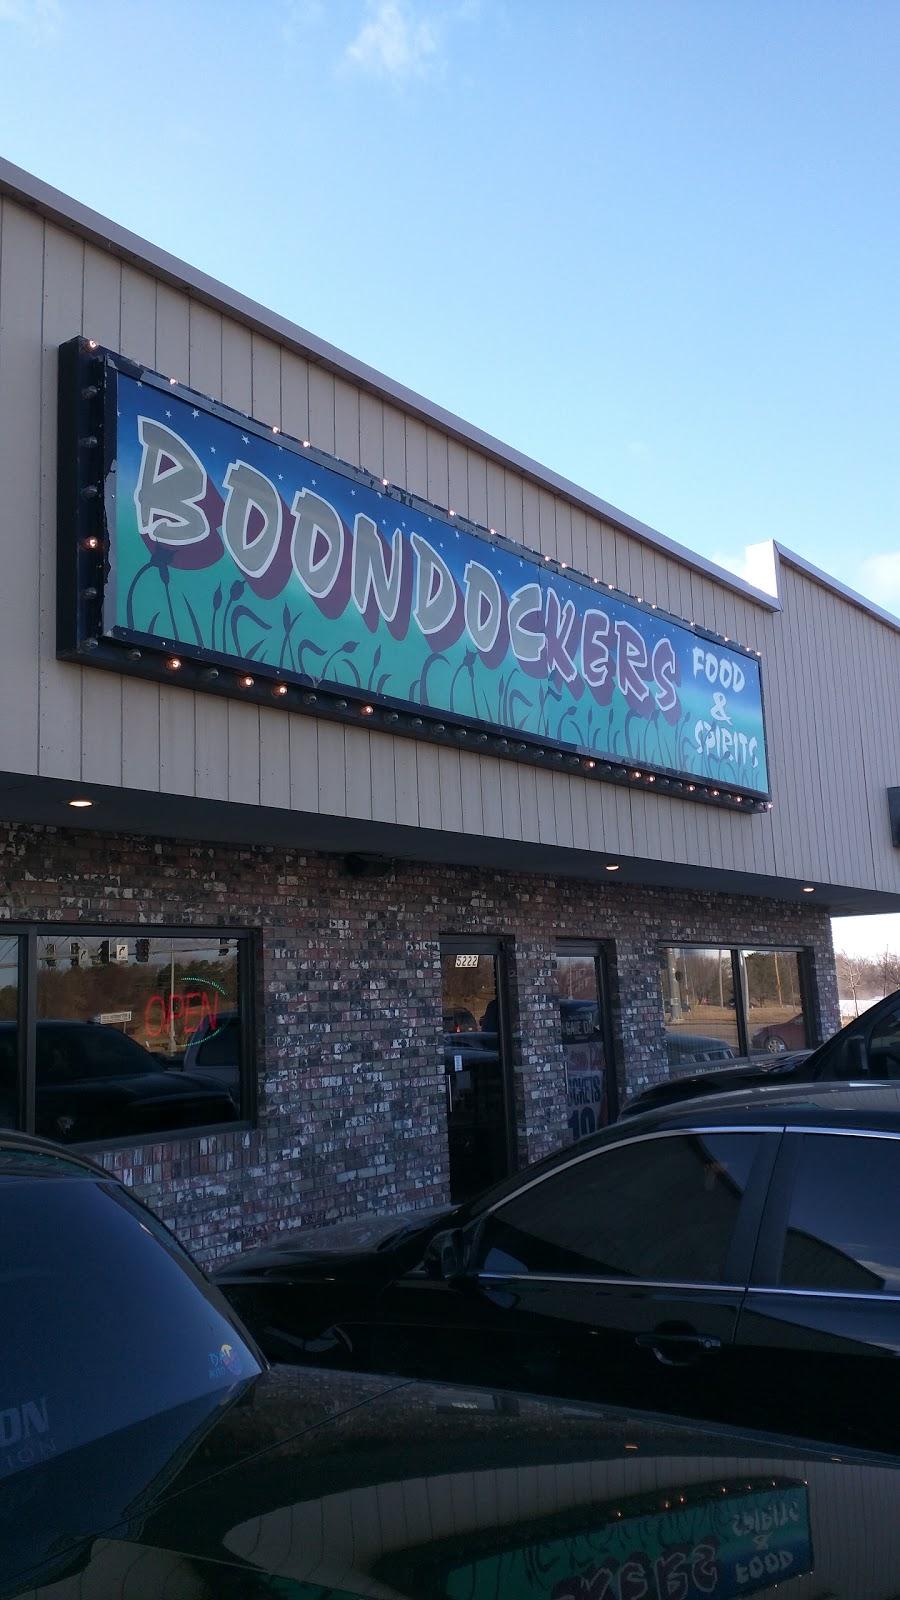 Boondockers | night club | 5222 N 120th St, Omaha, NE 68164, USA | 4024928000 OR +1 402-492-8000